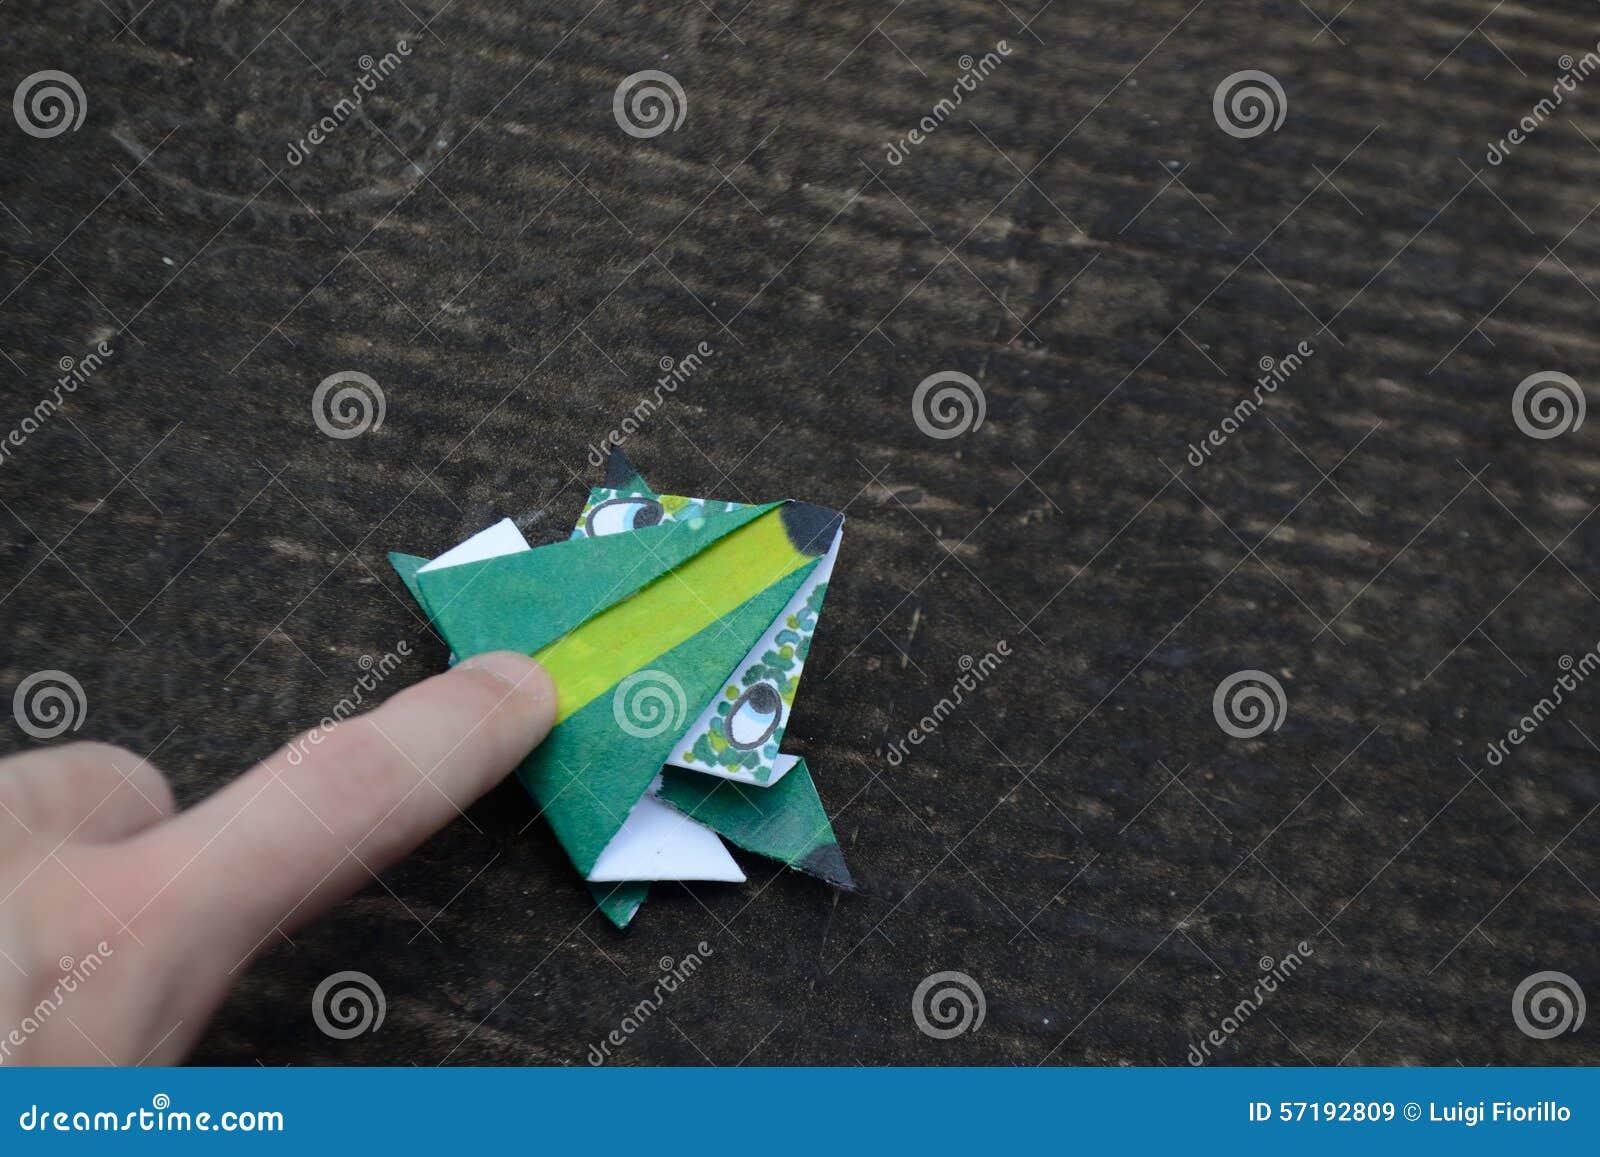 Origami, лягушка которая скачет